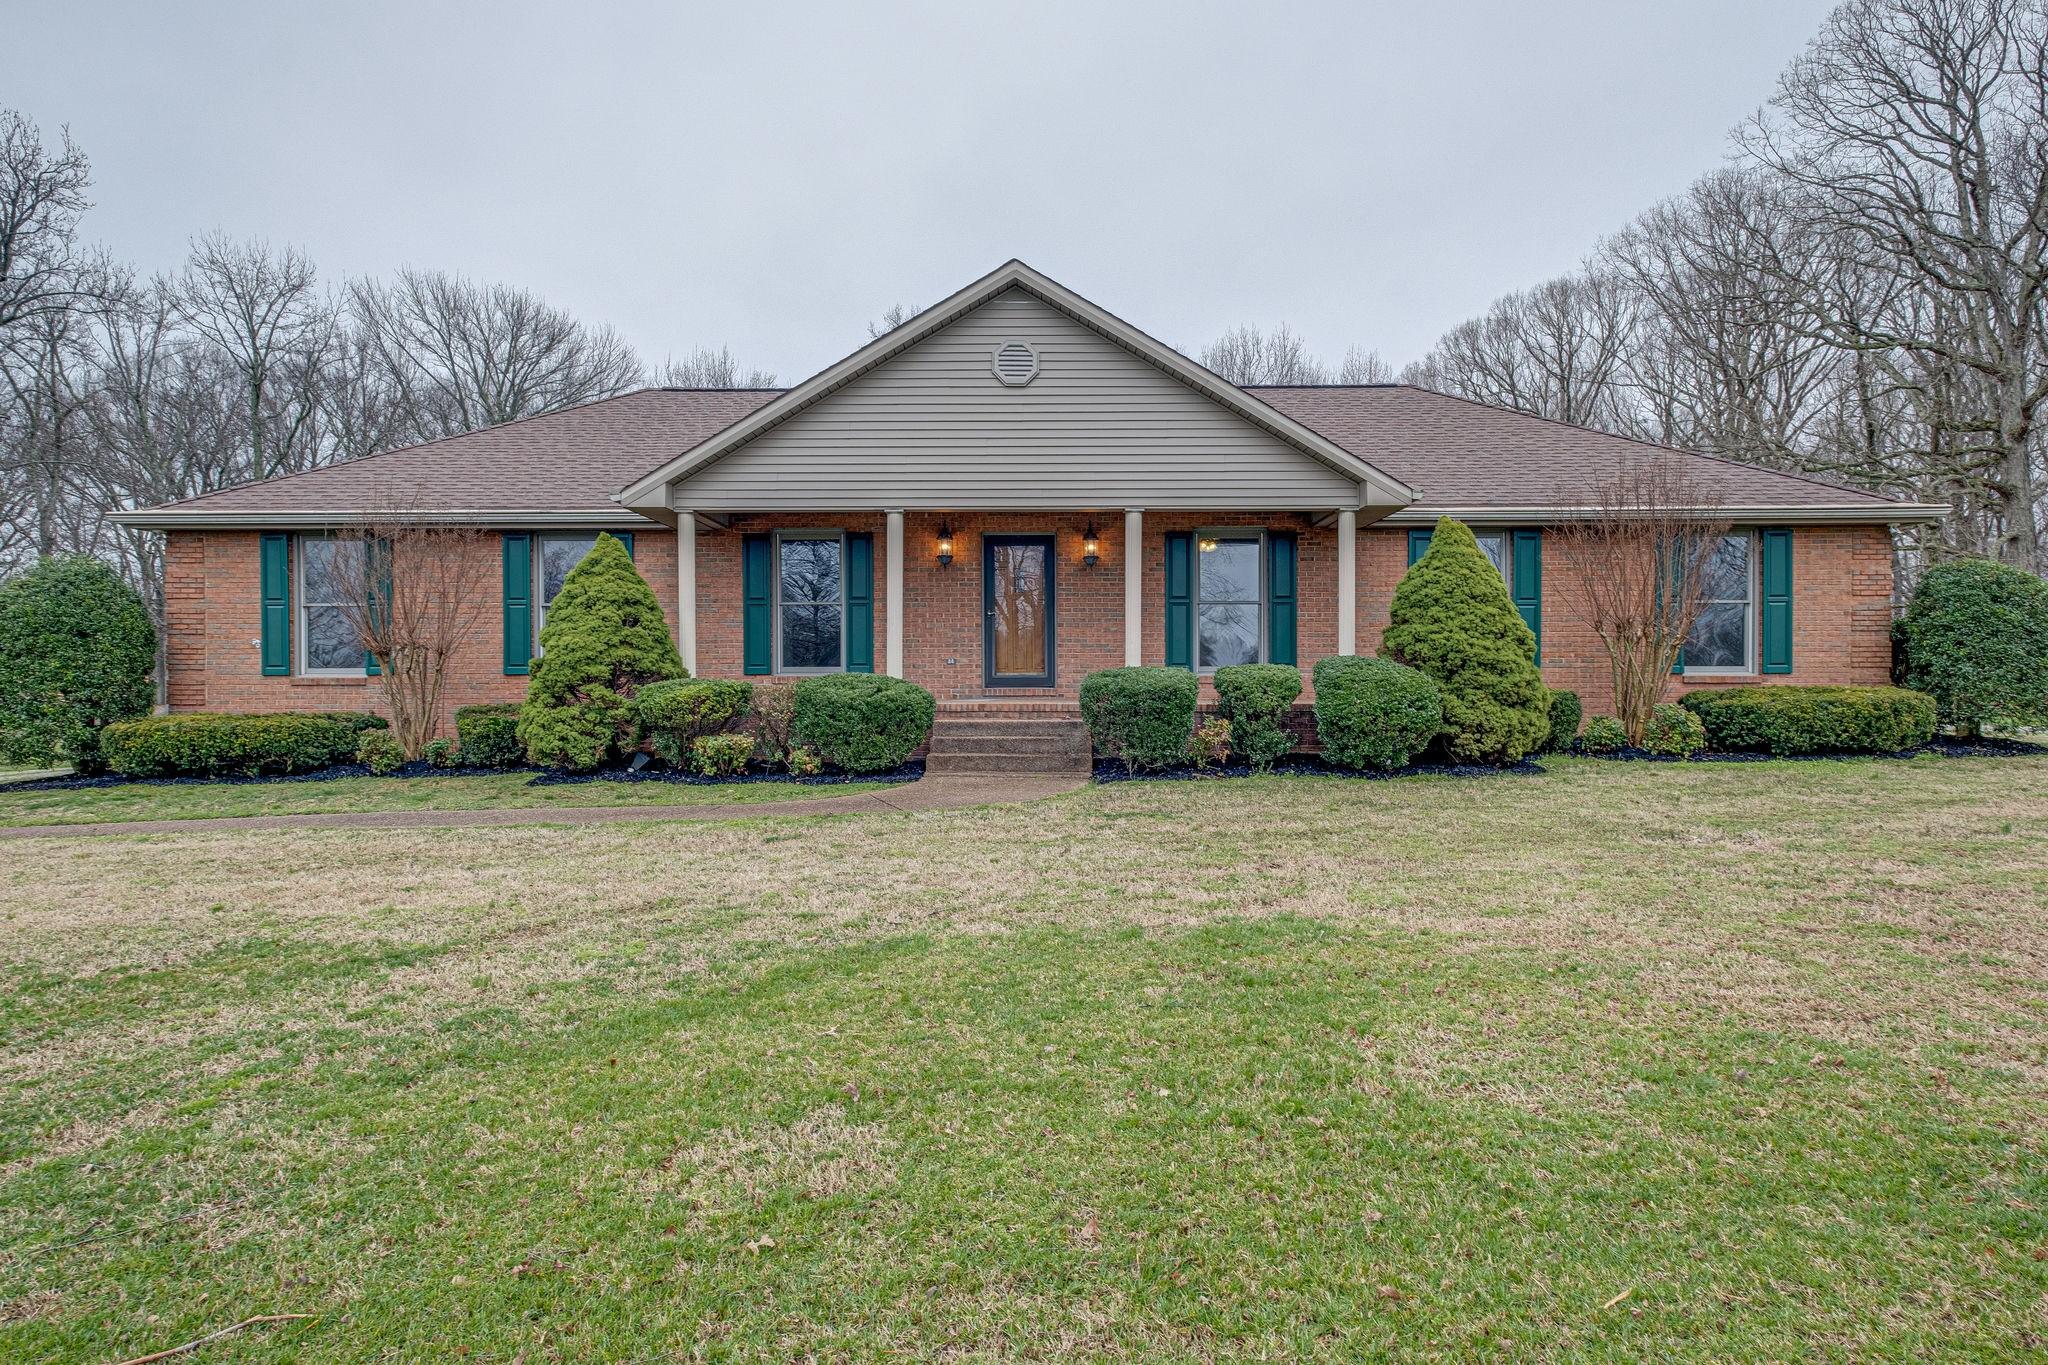 2755 Logan Rd, NW, Greenbrier, TN 37073 - Greenbrier, TN real estate listing